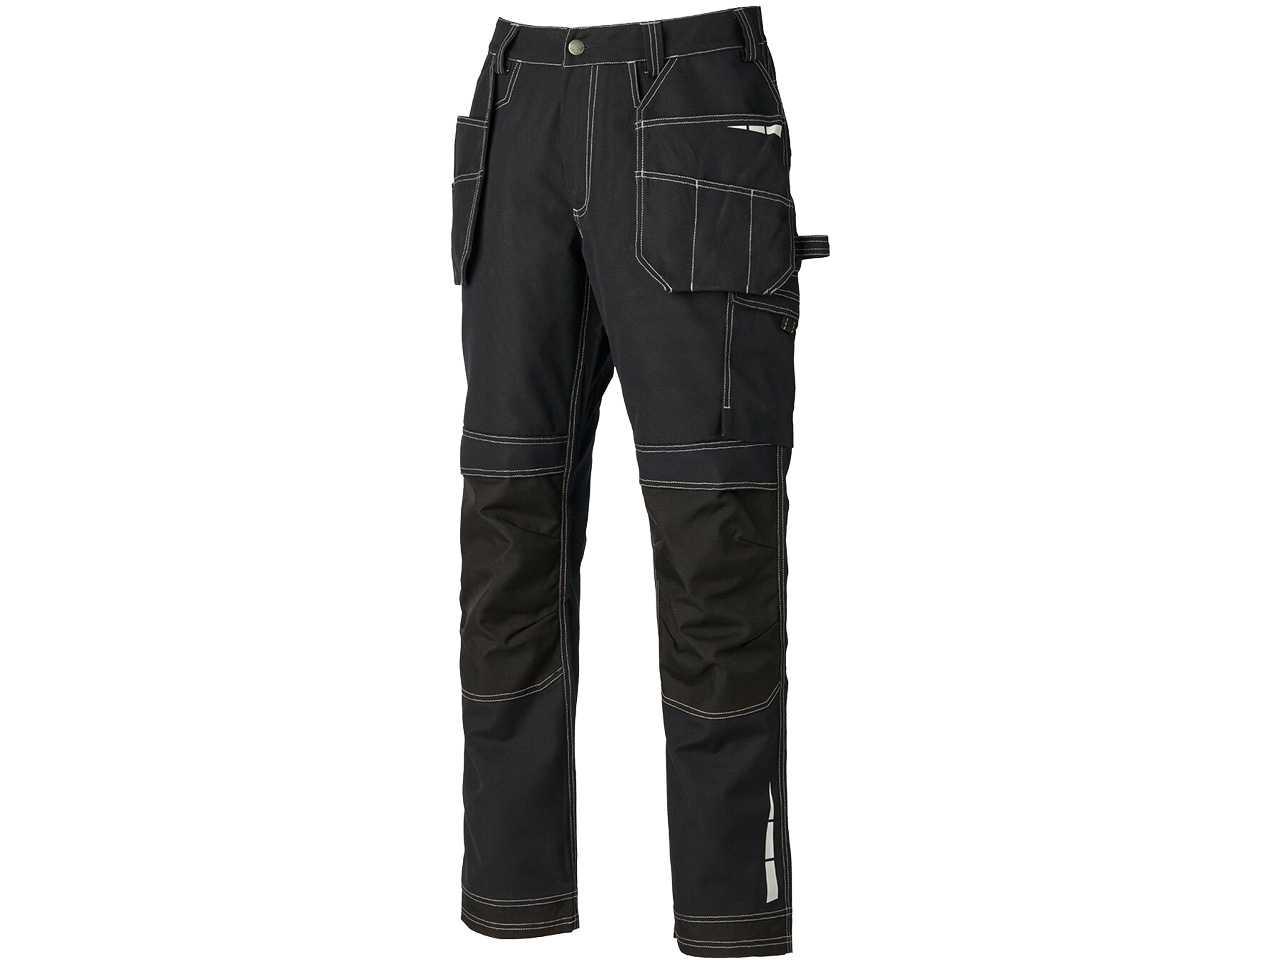 d5461e7c Clothing-Shoes,-Trousers